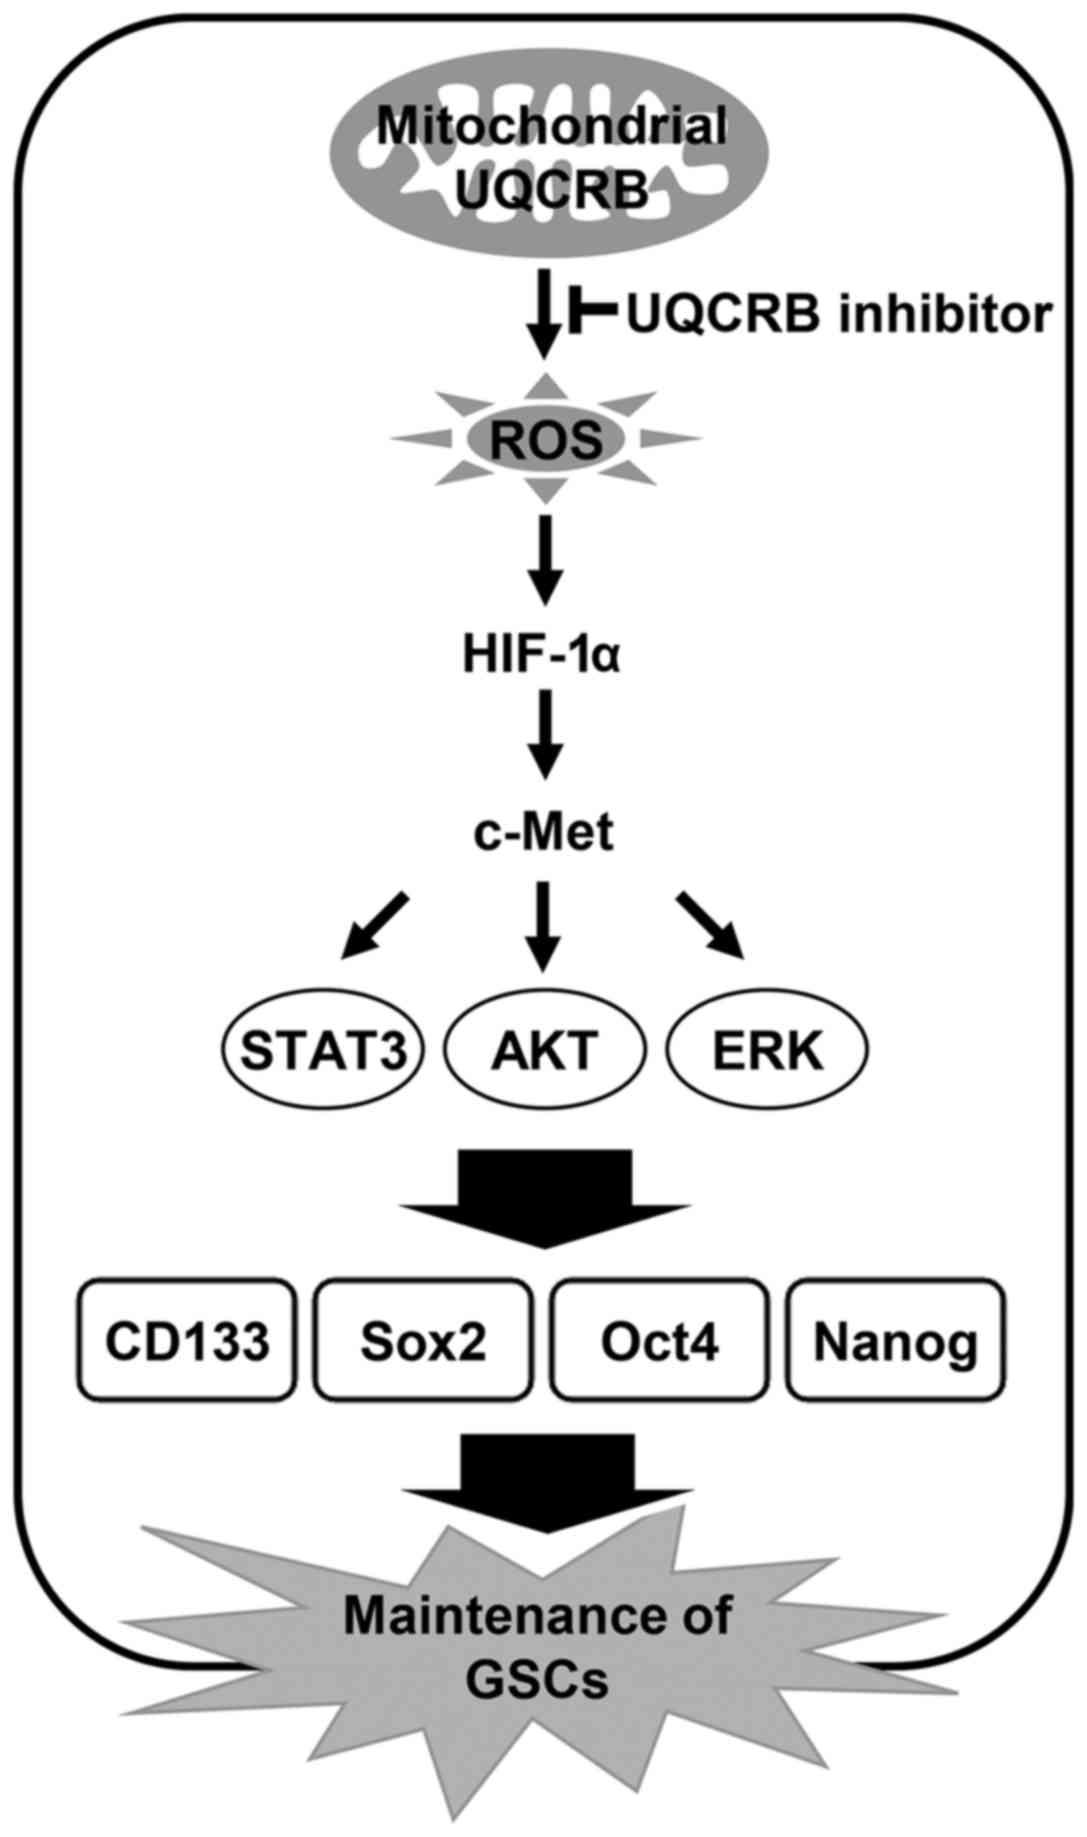 Downregulation of mitochondrial UQCRB inhibits cancer stem